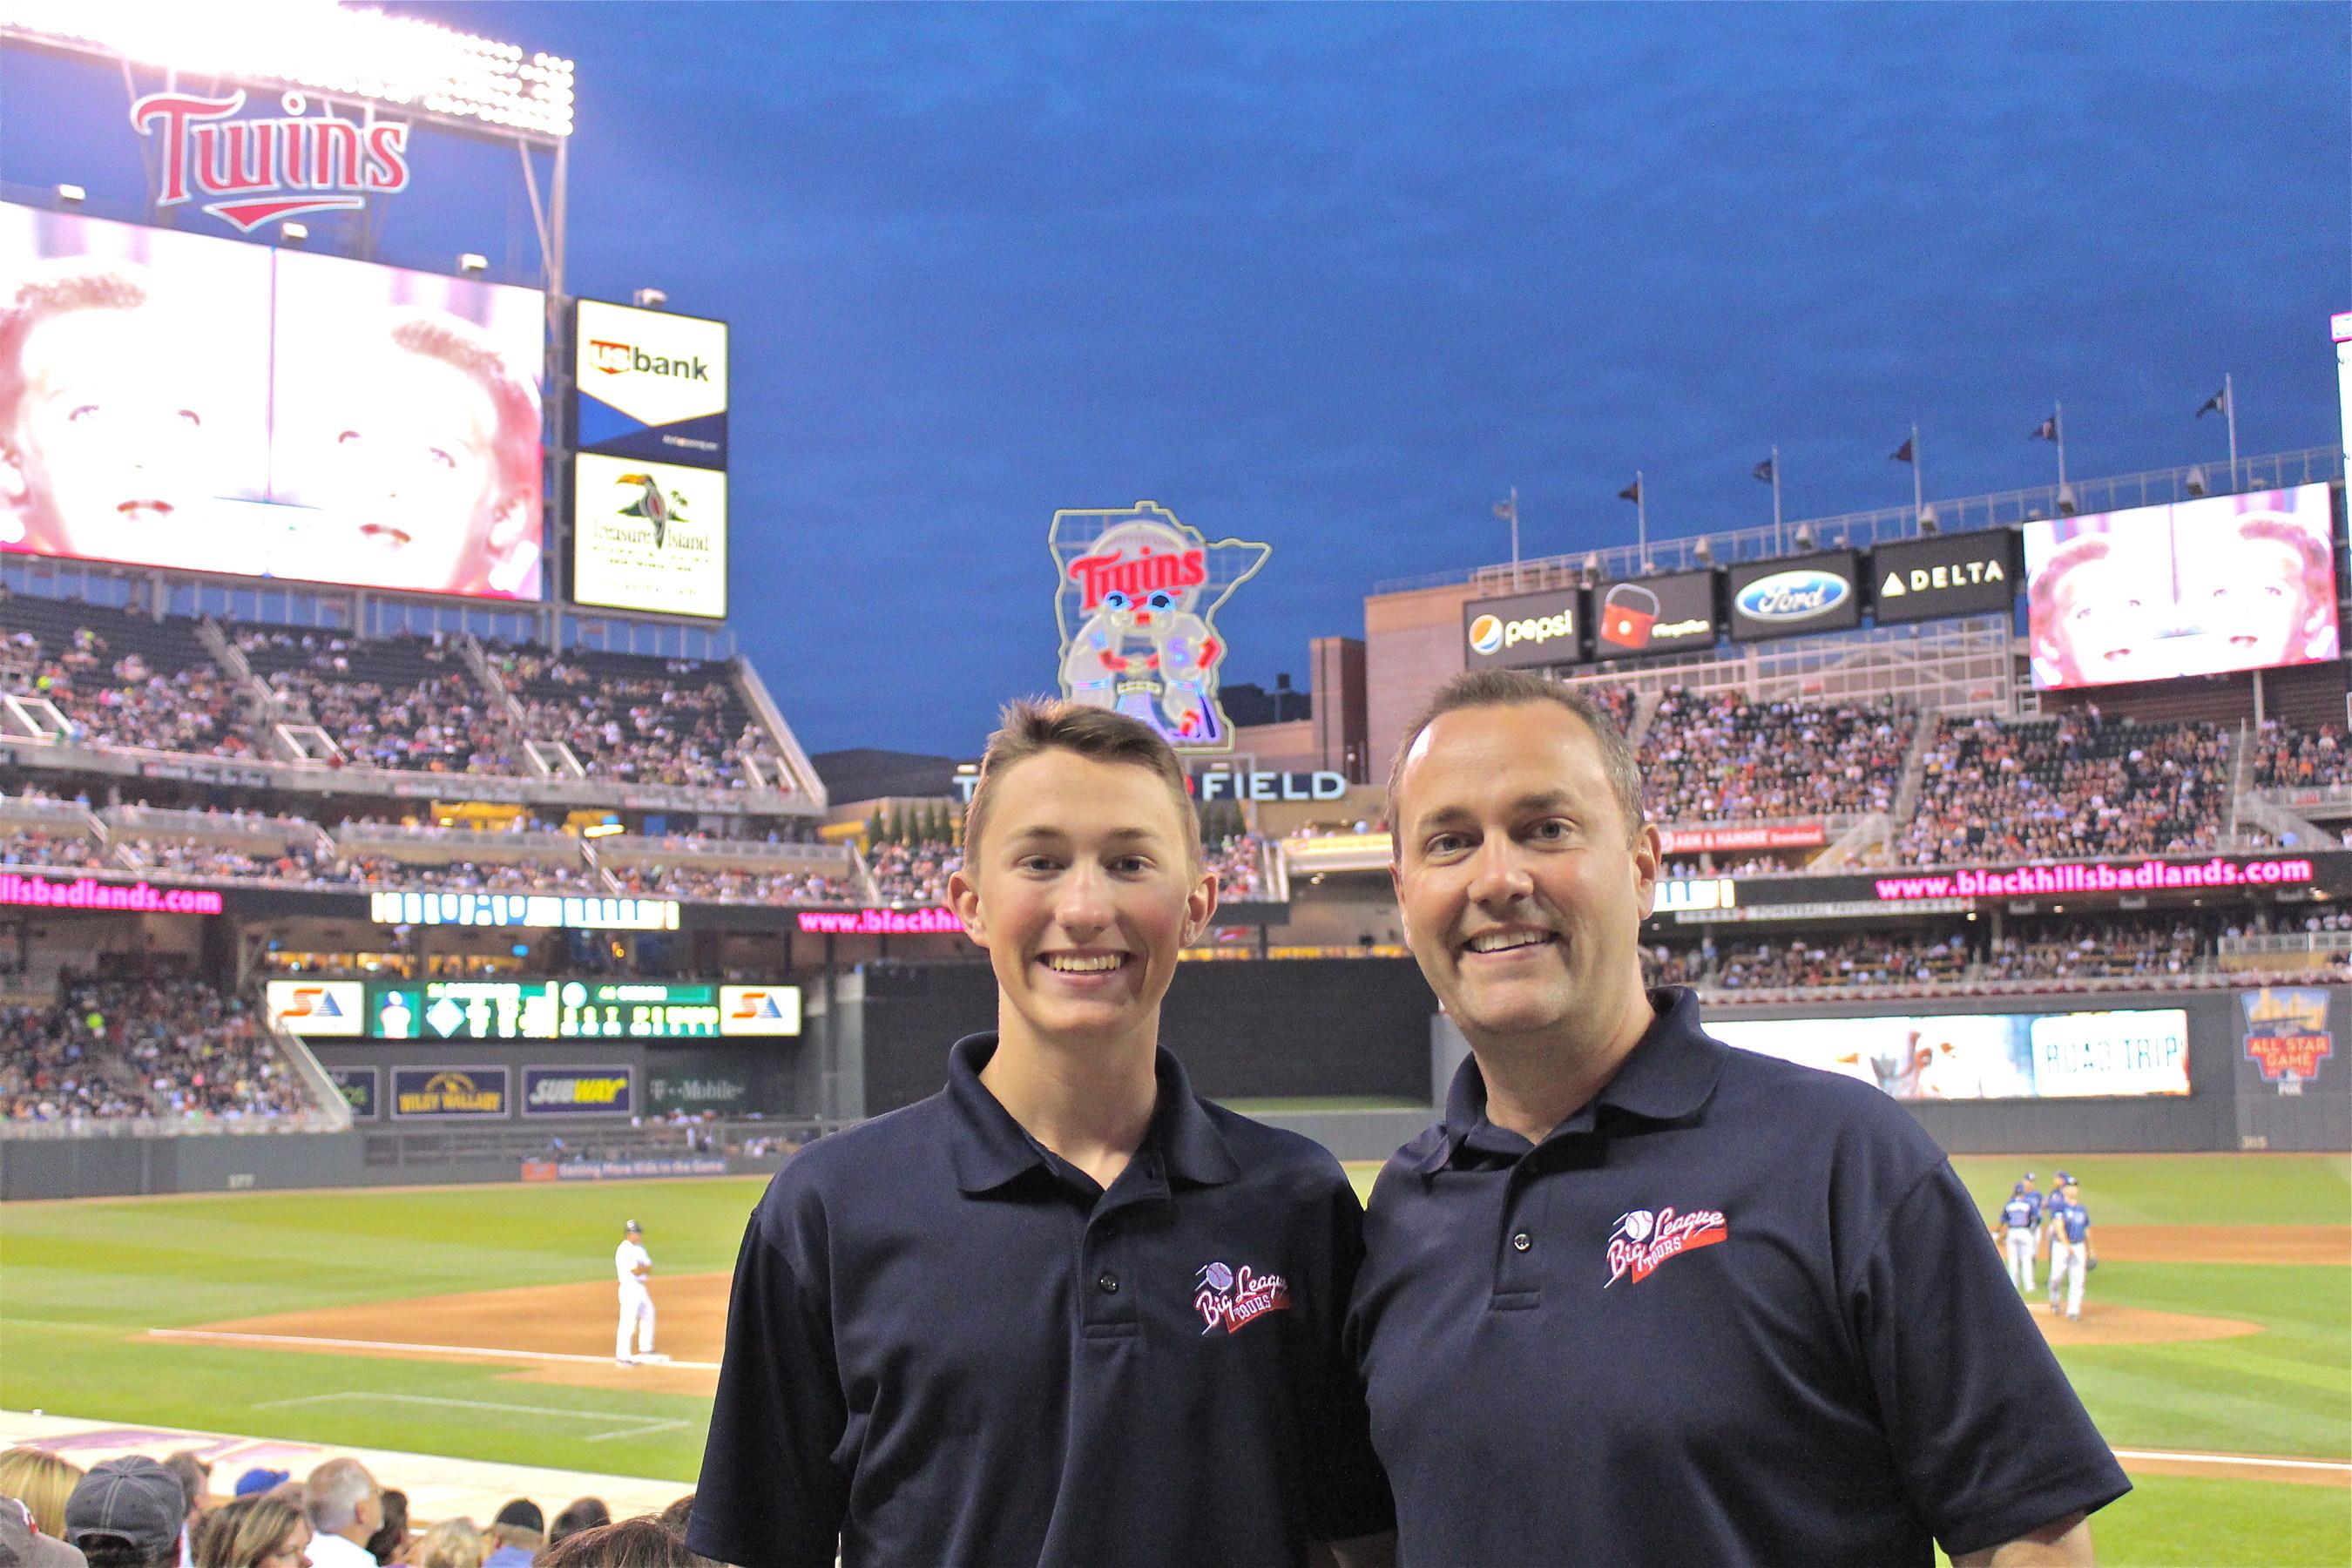 Glenn Dunlap and son, Hiatt share a moment together at Target Field celebrating their 30th baseball stadium.